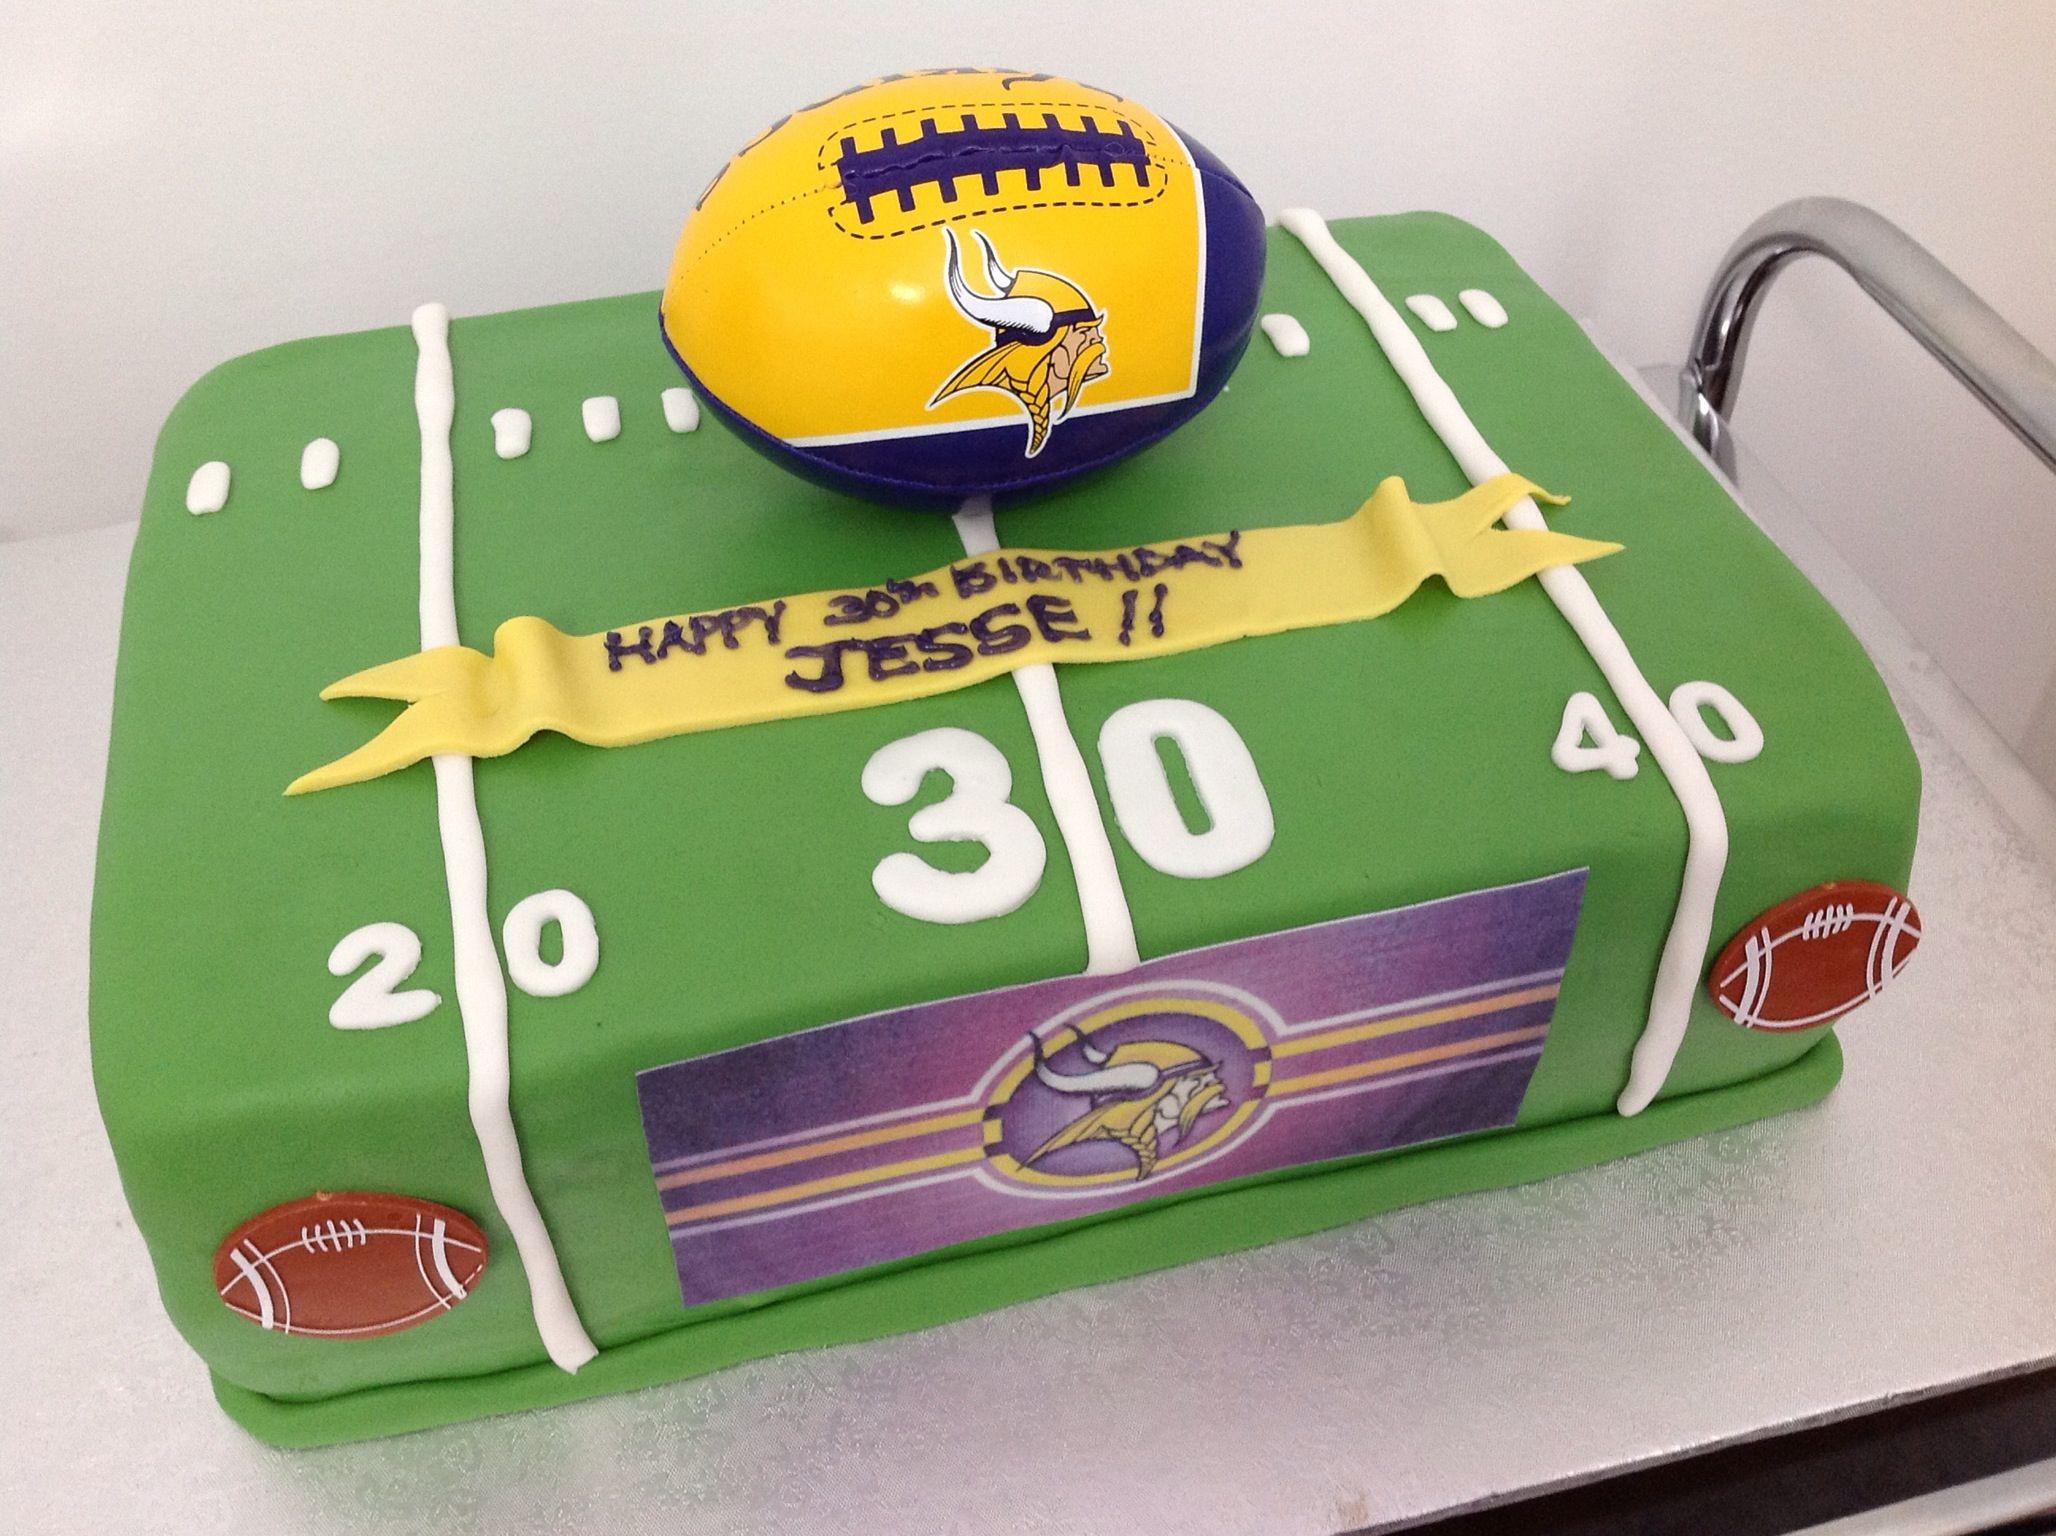 Football Cake For Th Birthday Minnesota Vikings Fan Box Of - Football cakes for birthdays